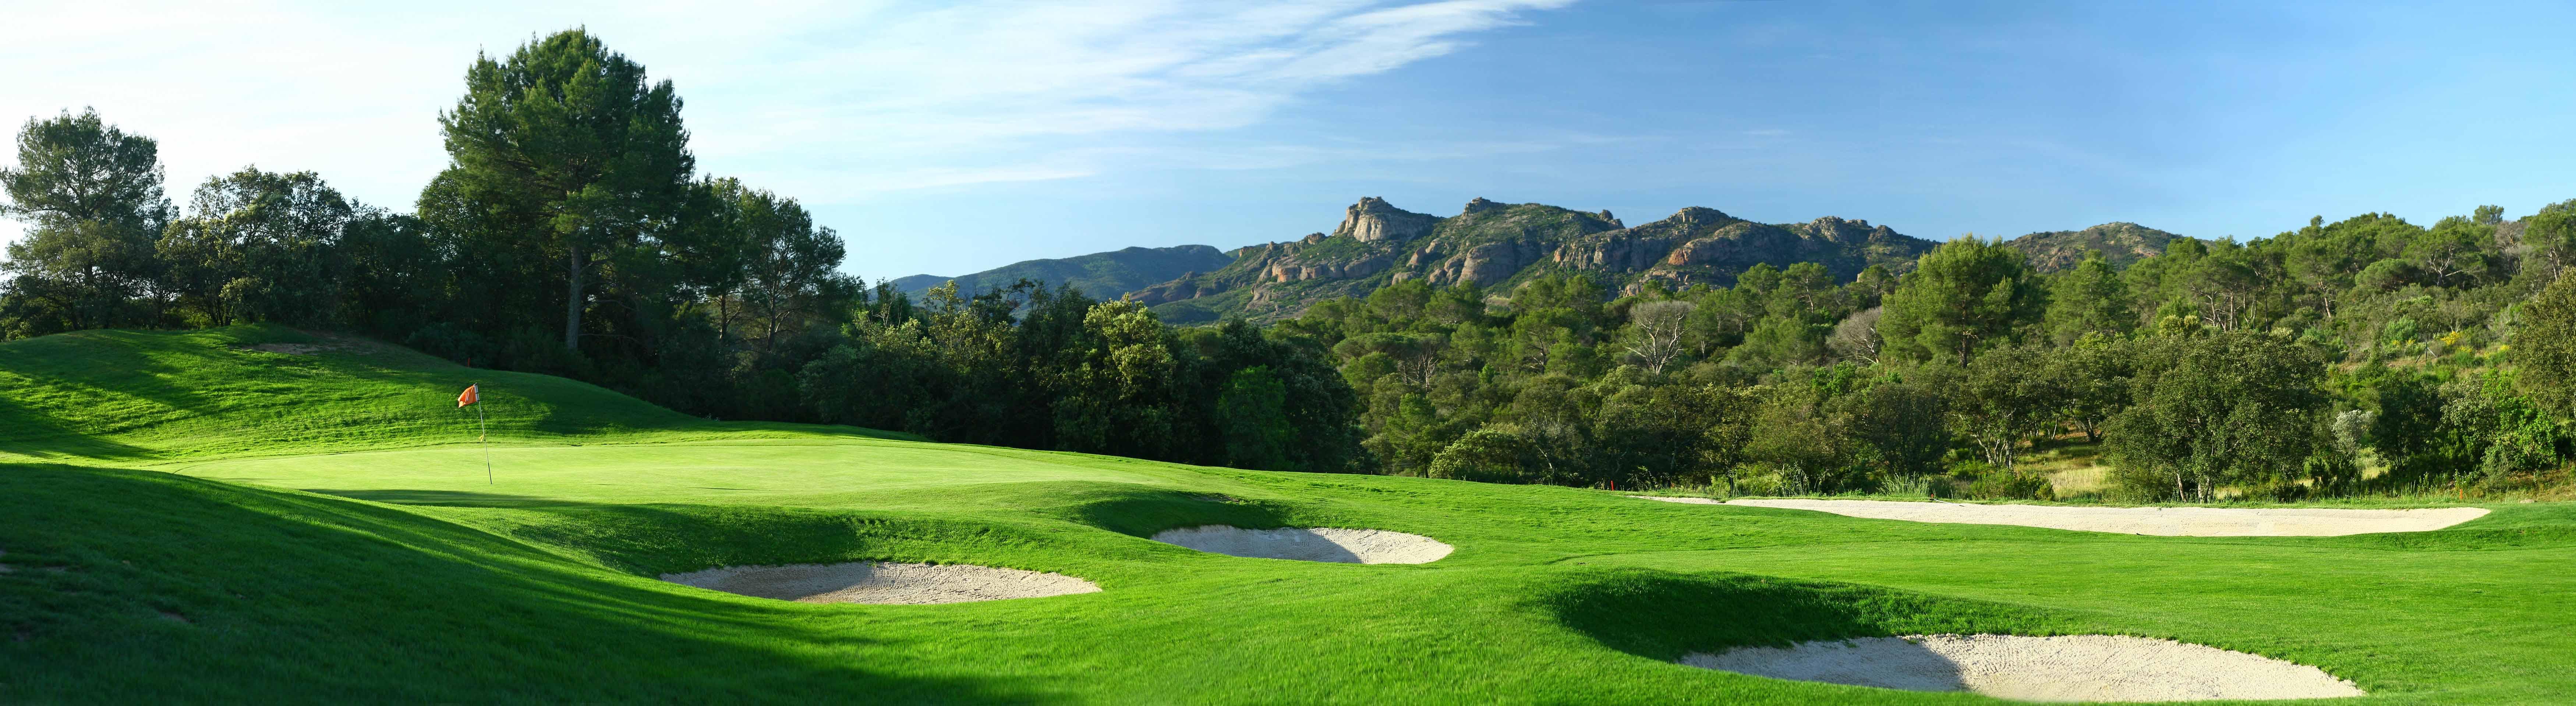 golf-expedition-golf-reizen-frankrijk-regio-cote-d'azur-Les-Domaines-de-Saint-Endréol-Golf-en-Spa-Resort-panorama-golfbaan-omgeving